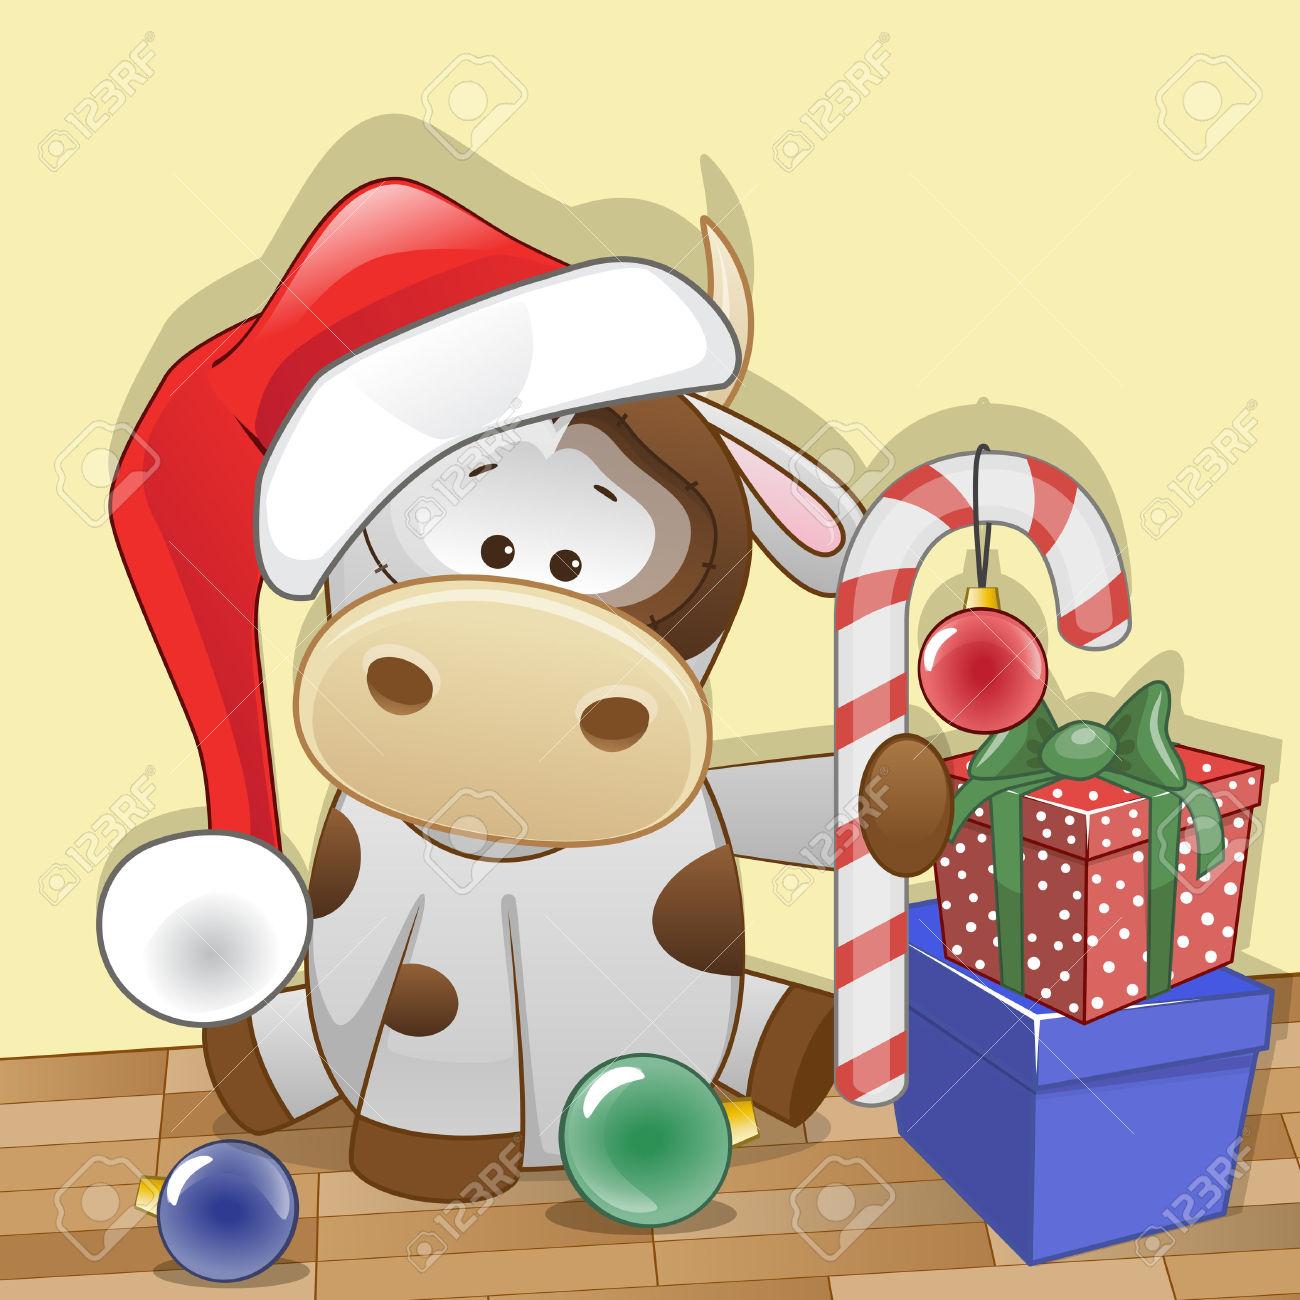 Christmas Illustration Of Cartoon Santa Cow Royalty Free Cliparts.